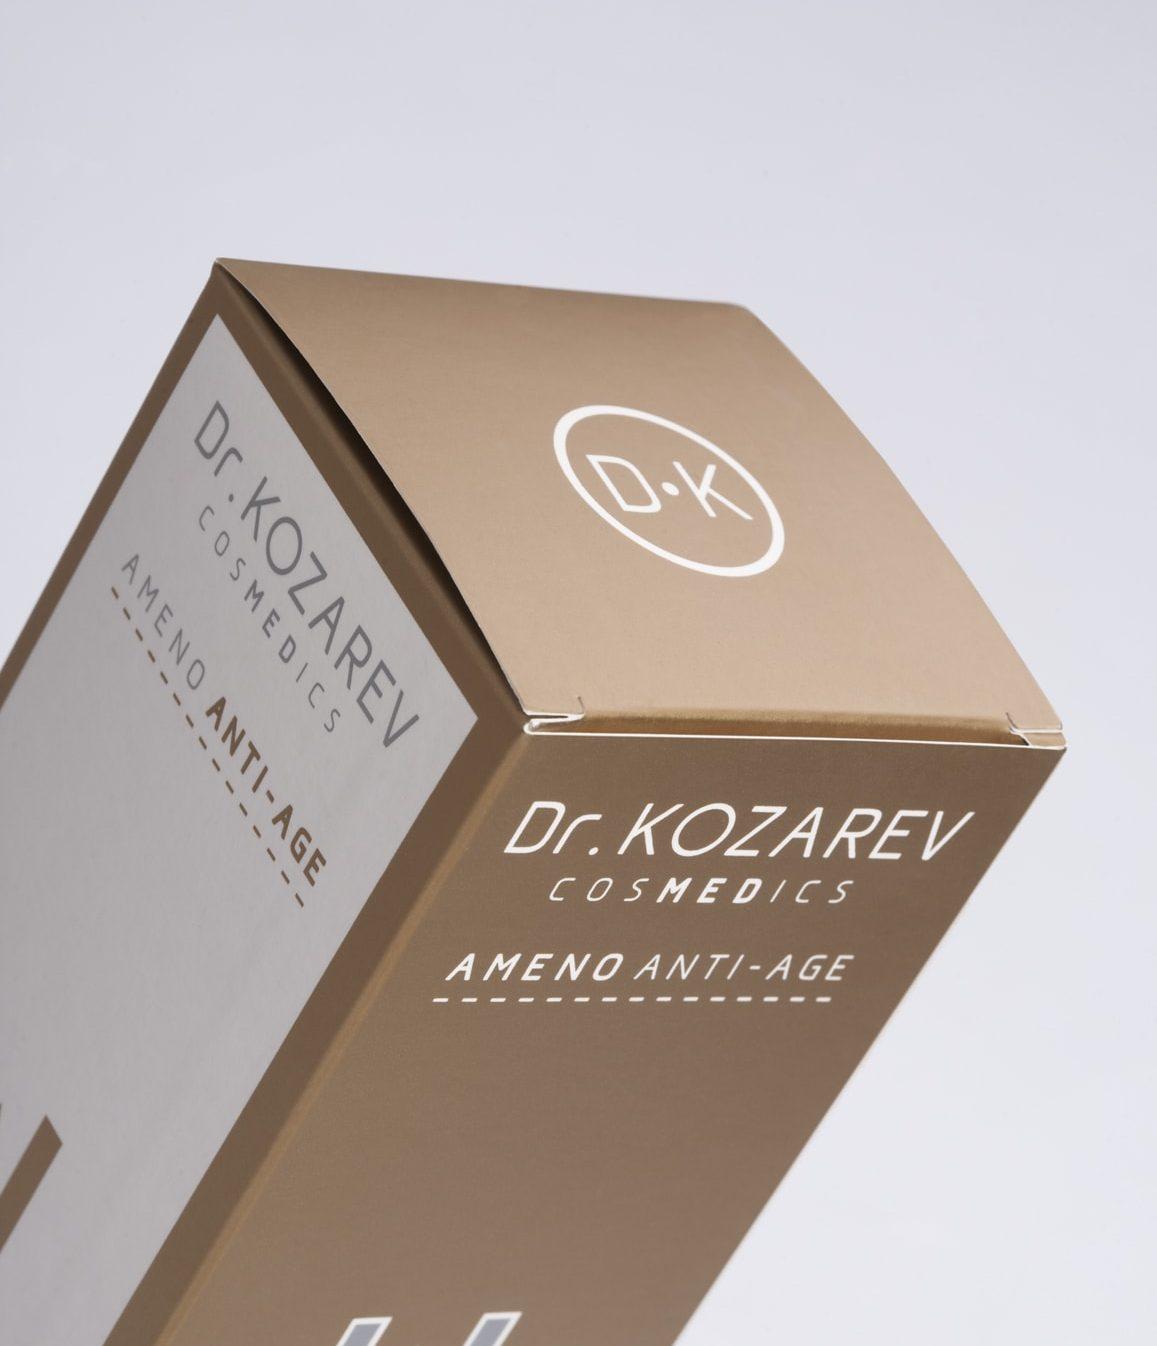 DrKozarev_Cosmetics_Shonski_packaging_AmenoAntiAgeLine_wash